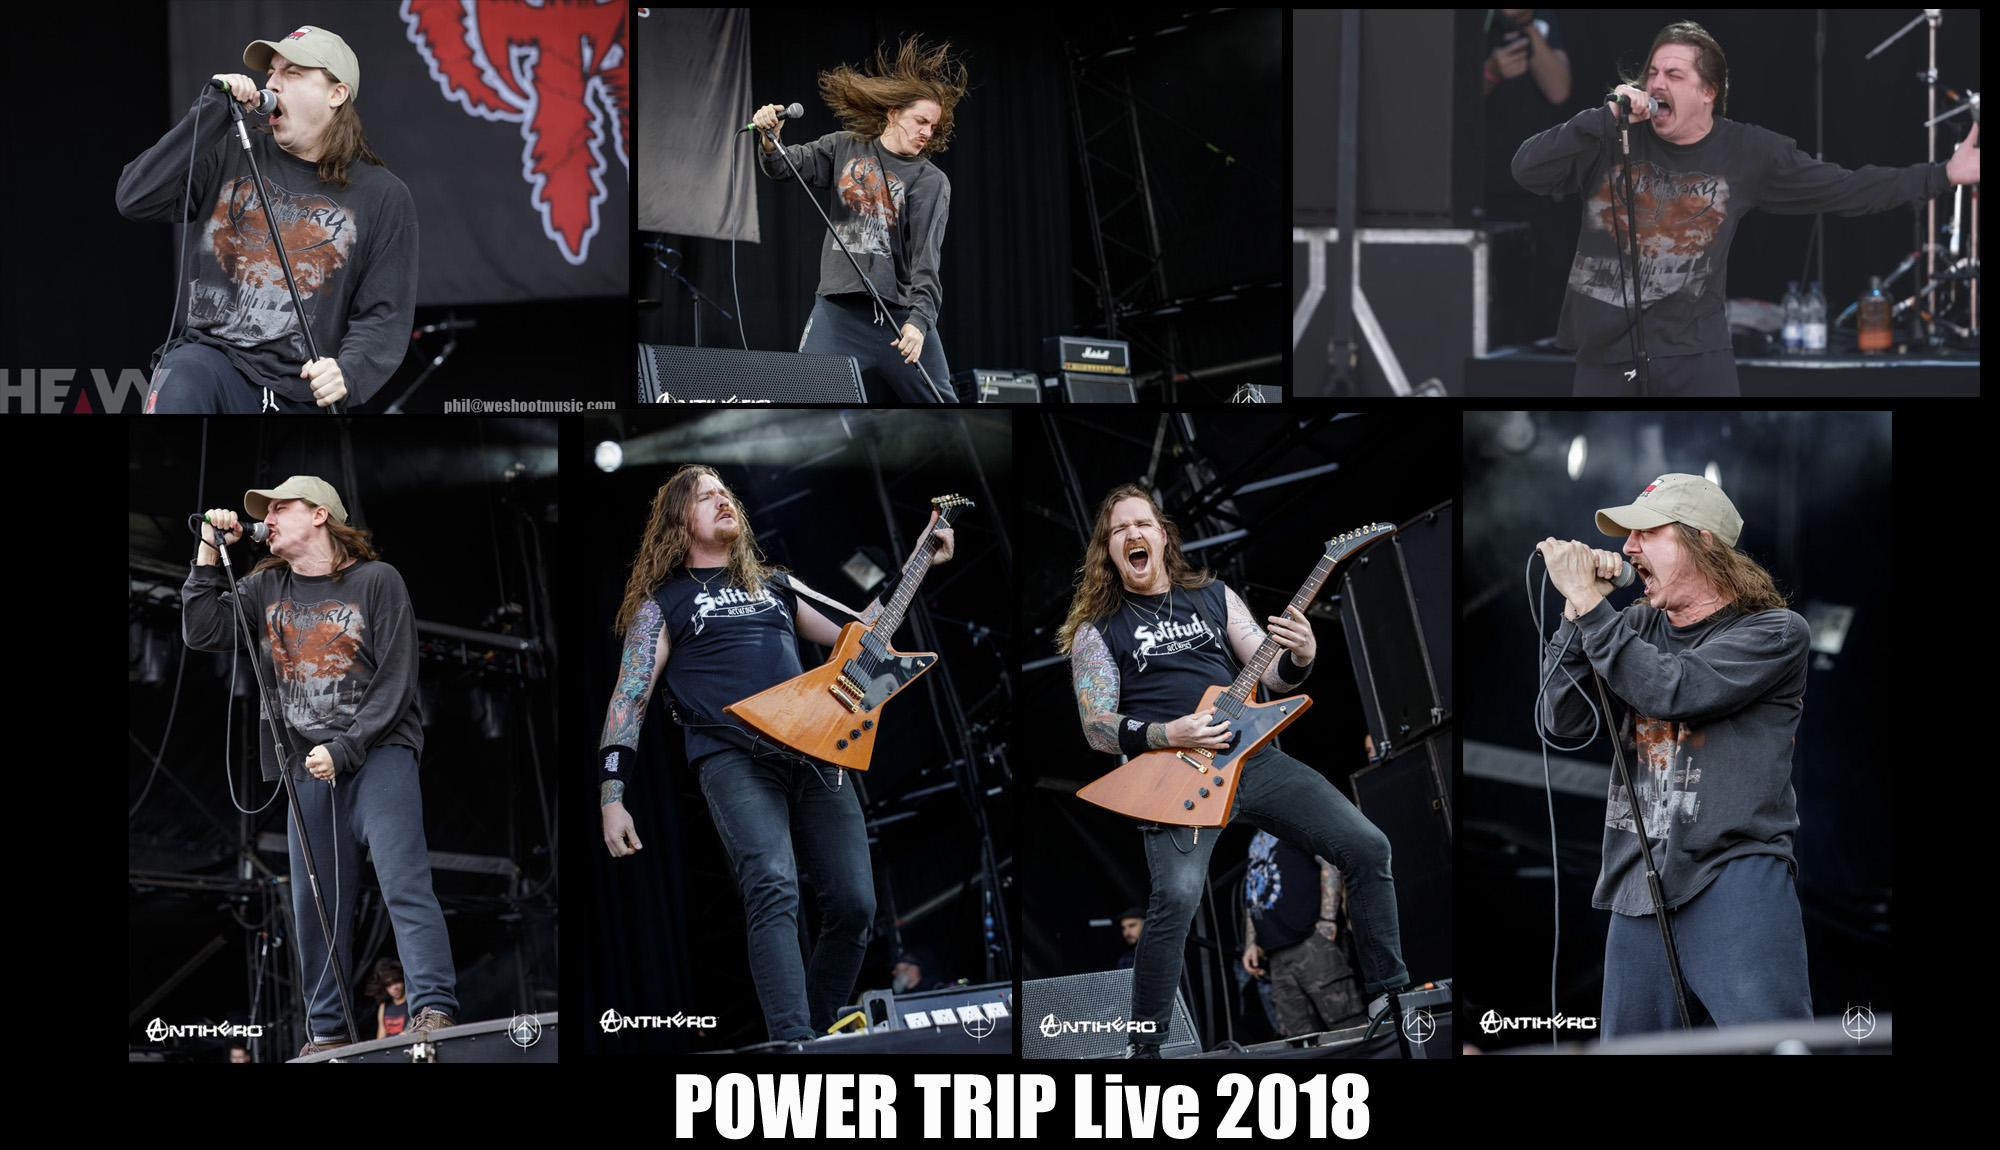 POWER TRIP Live au Bloodstock 2018 (Set complet en HD) Power_10